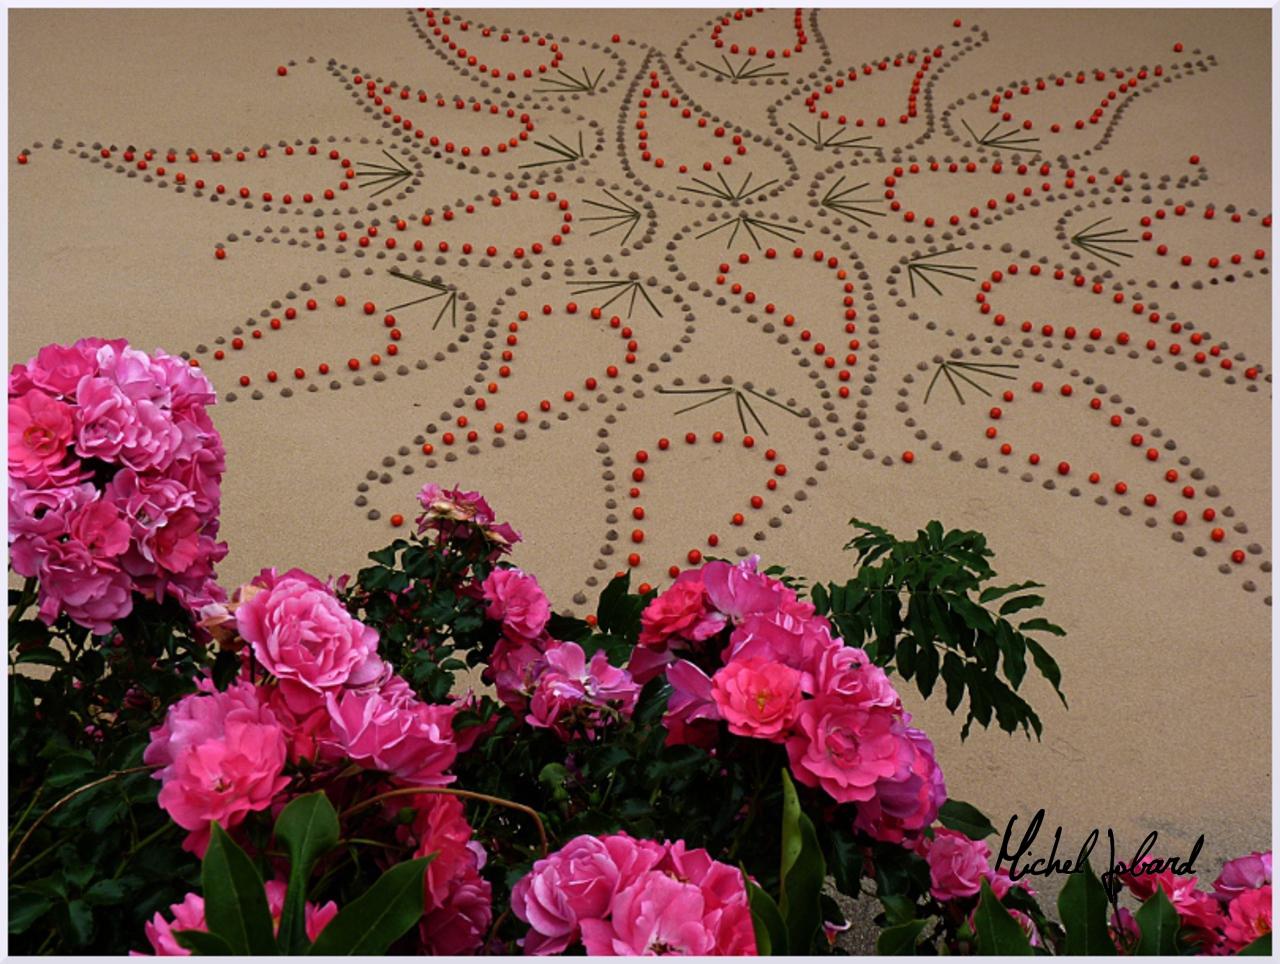 Land art Rose des vents, Michel Jobard